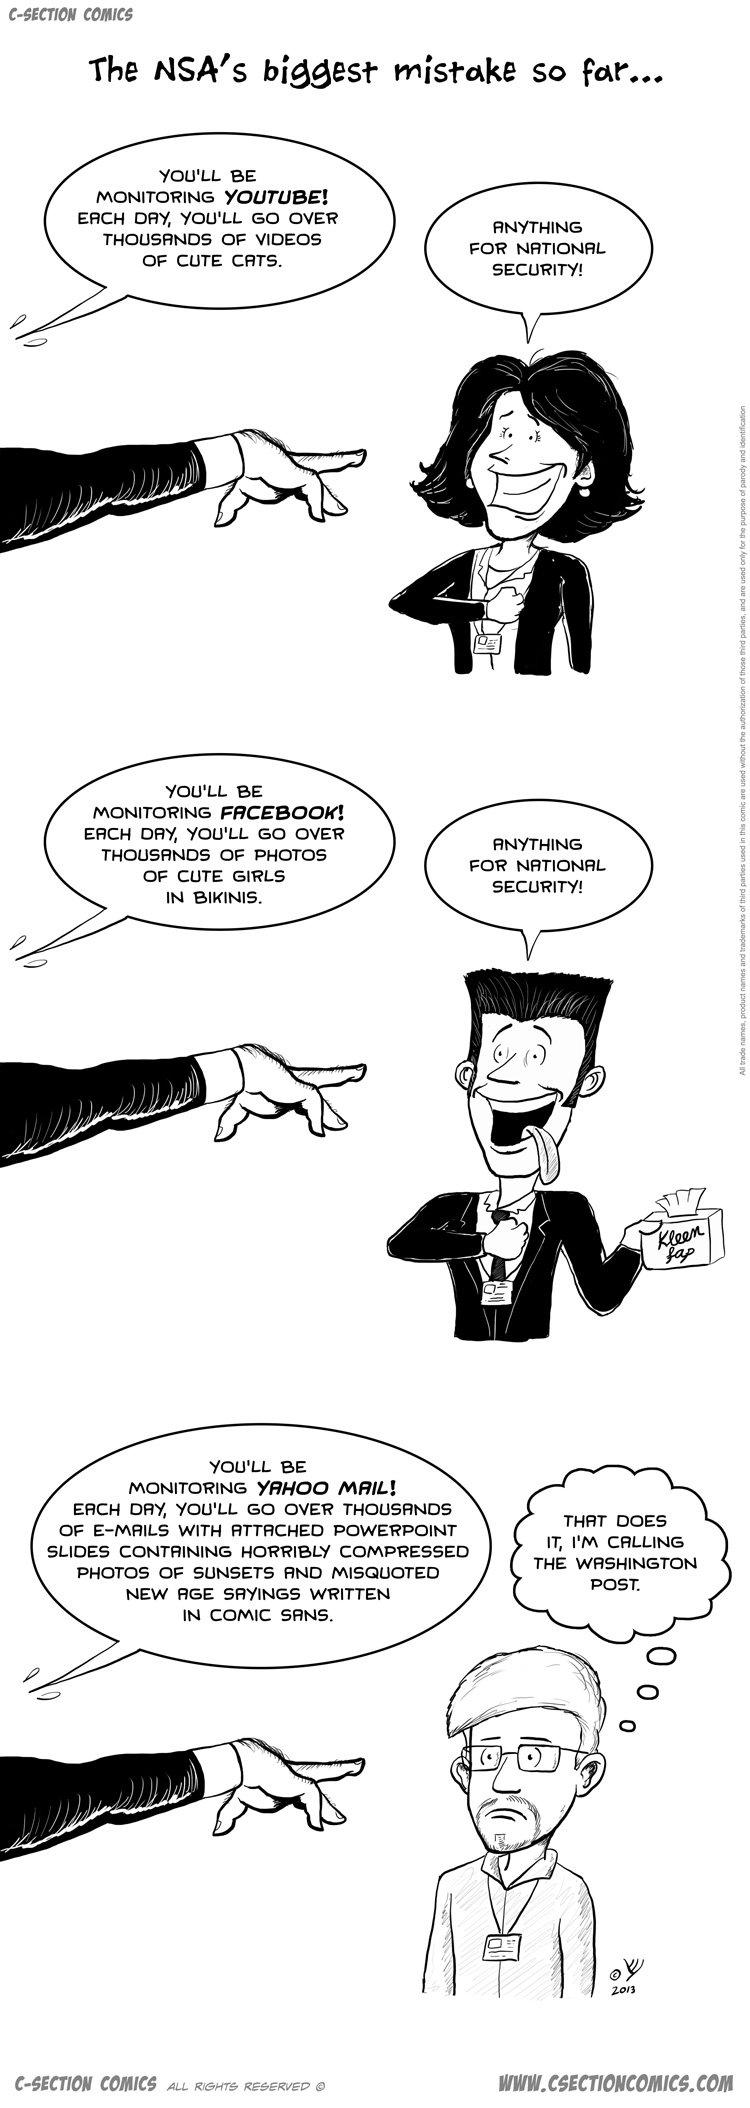 Big mistake, NSA. More cartoons as . The NSA' s biggest so far.,,,, ARCH tom', YDU' LL ED OVER cm CUTE EDITS. RN': -'THINGS SECURITY! LL BE ARCH an as CAER THRU